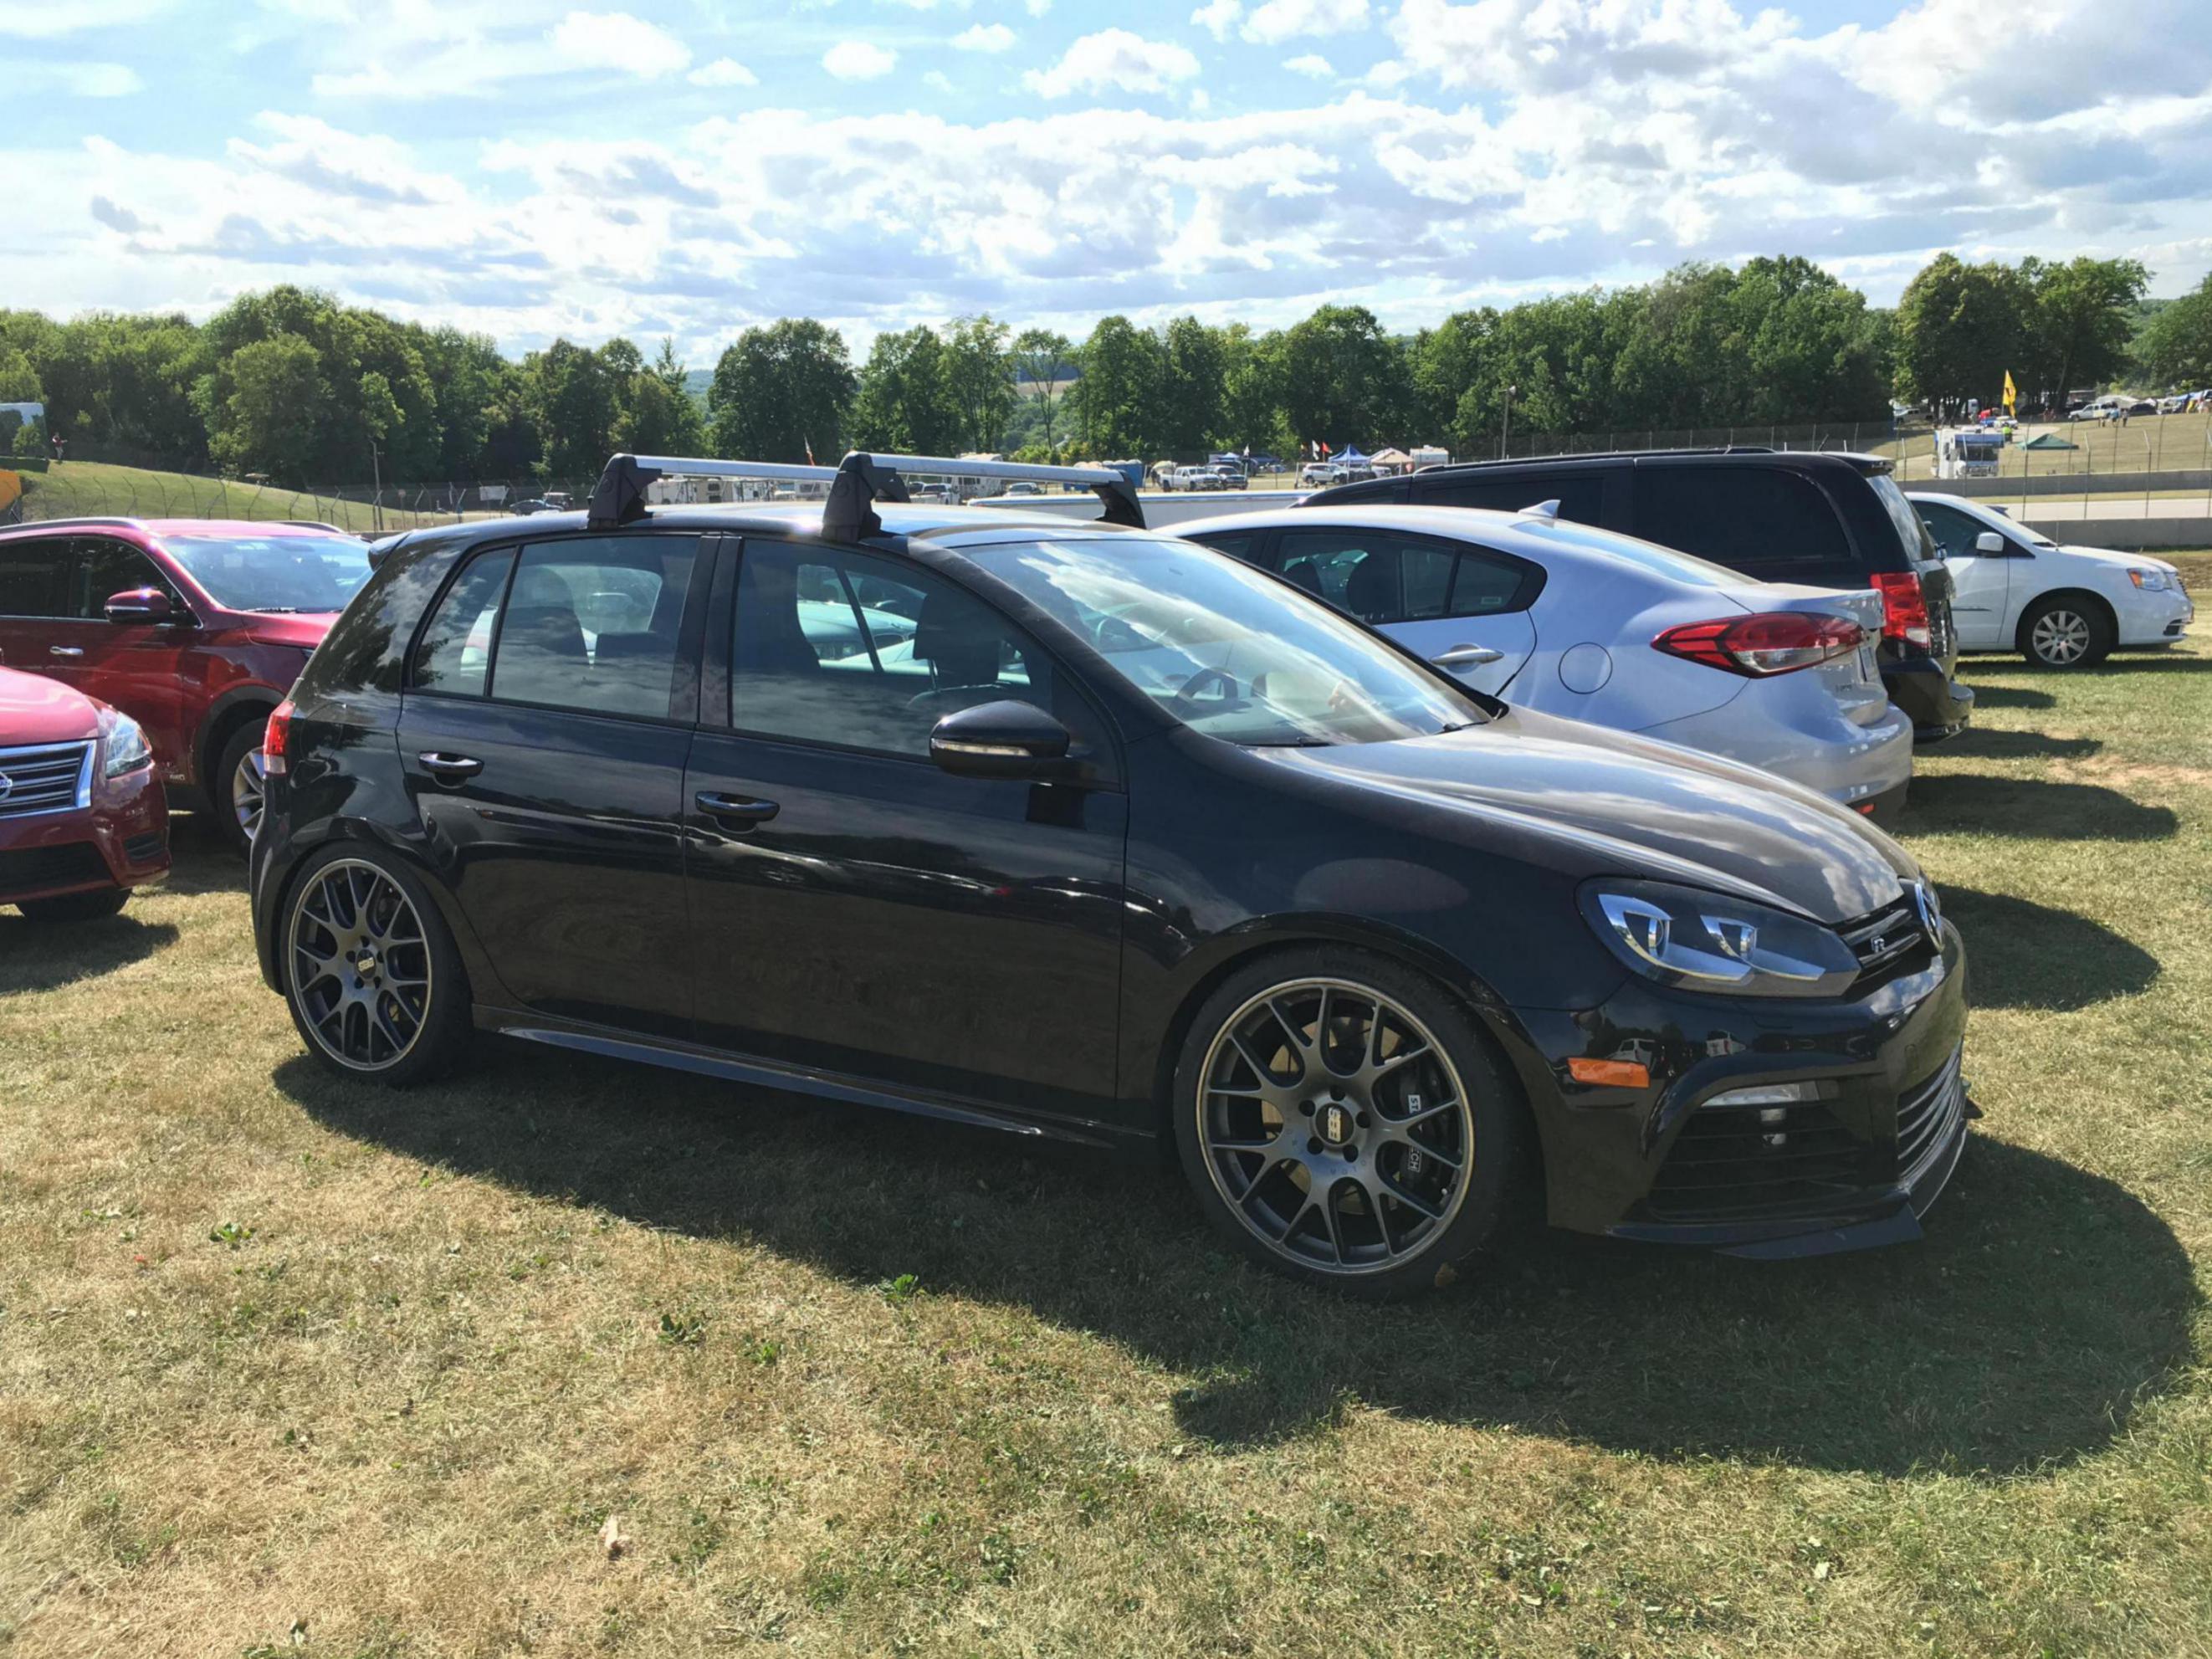 Wheel Color for Carbide Gray Subaru Outback Subaru